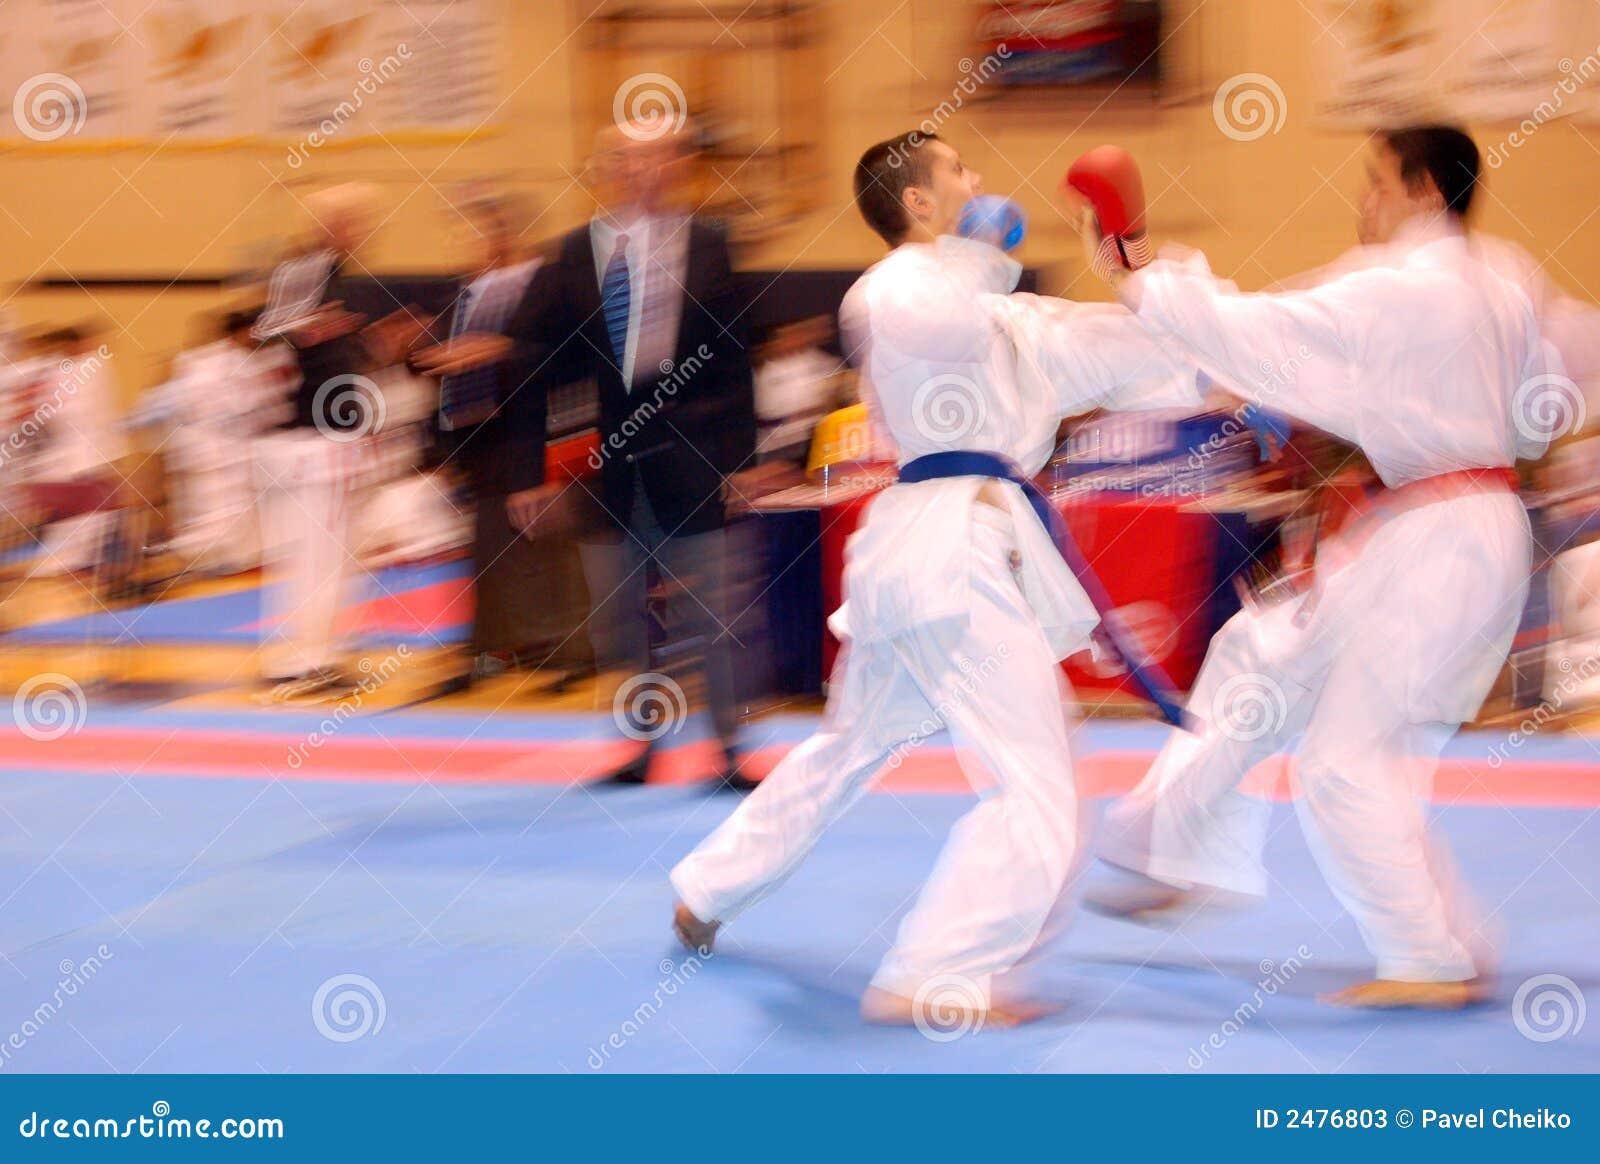 Attack in karate combat